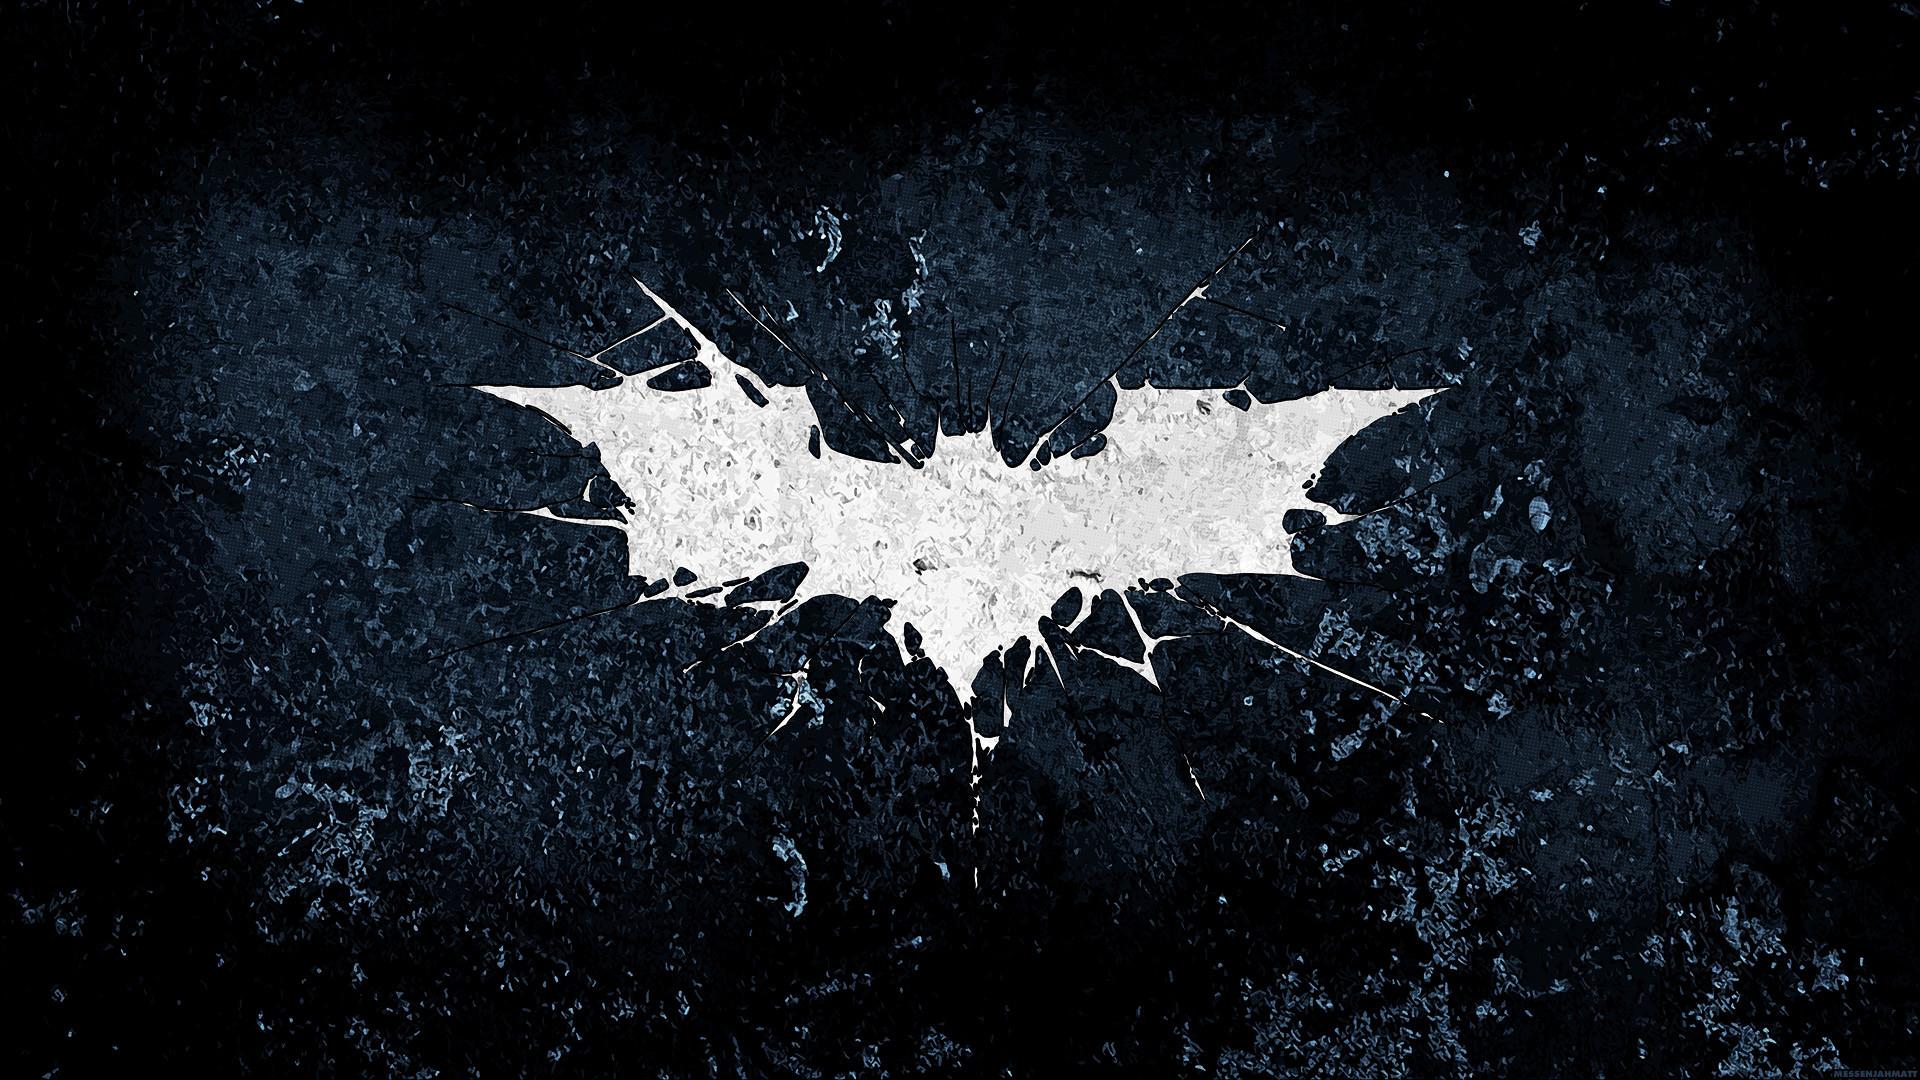 The Dark Knight Rises Wallpapers HD. Image Source ·  the_dark_knight_rises_hd_wallpapers_desktop_backgrounds_latest_2012_batman_symbol_wallpapers